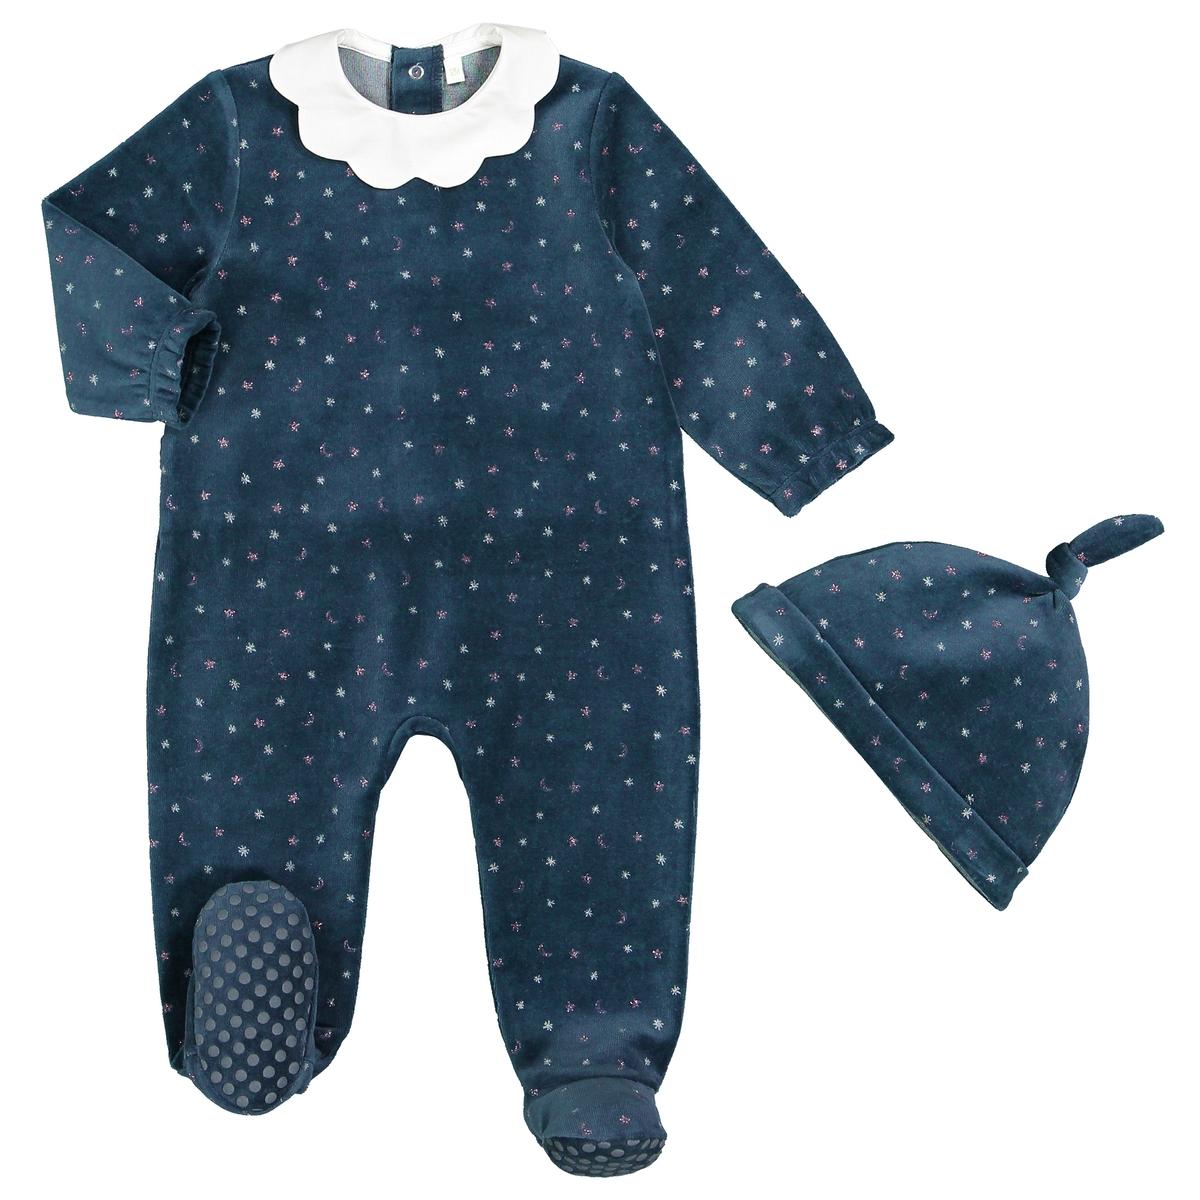 цена Комплект пижама и шапочка из La Redoute Велюра мес 3 года - 94 см синий онлайн в 2017 году